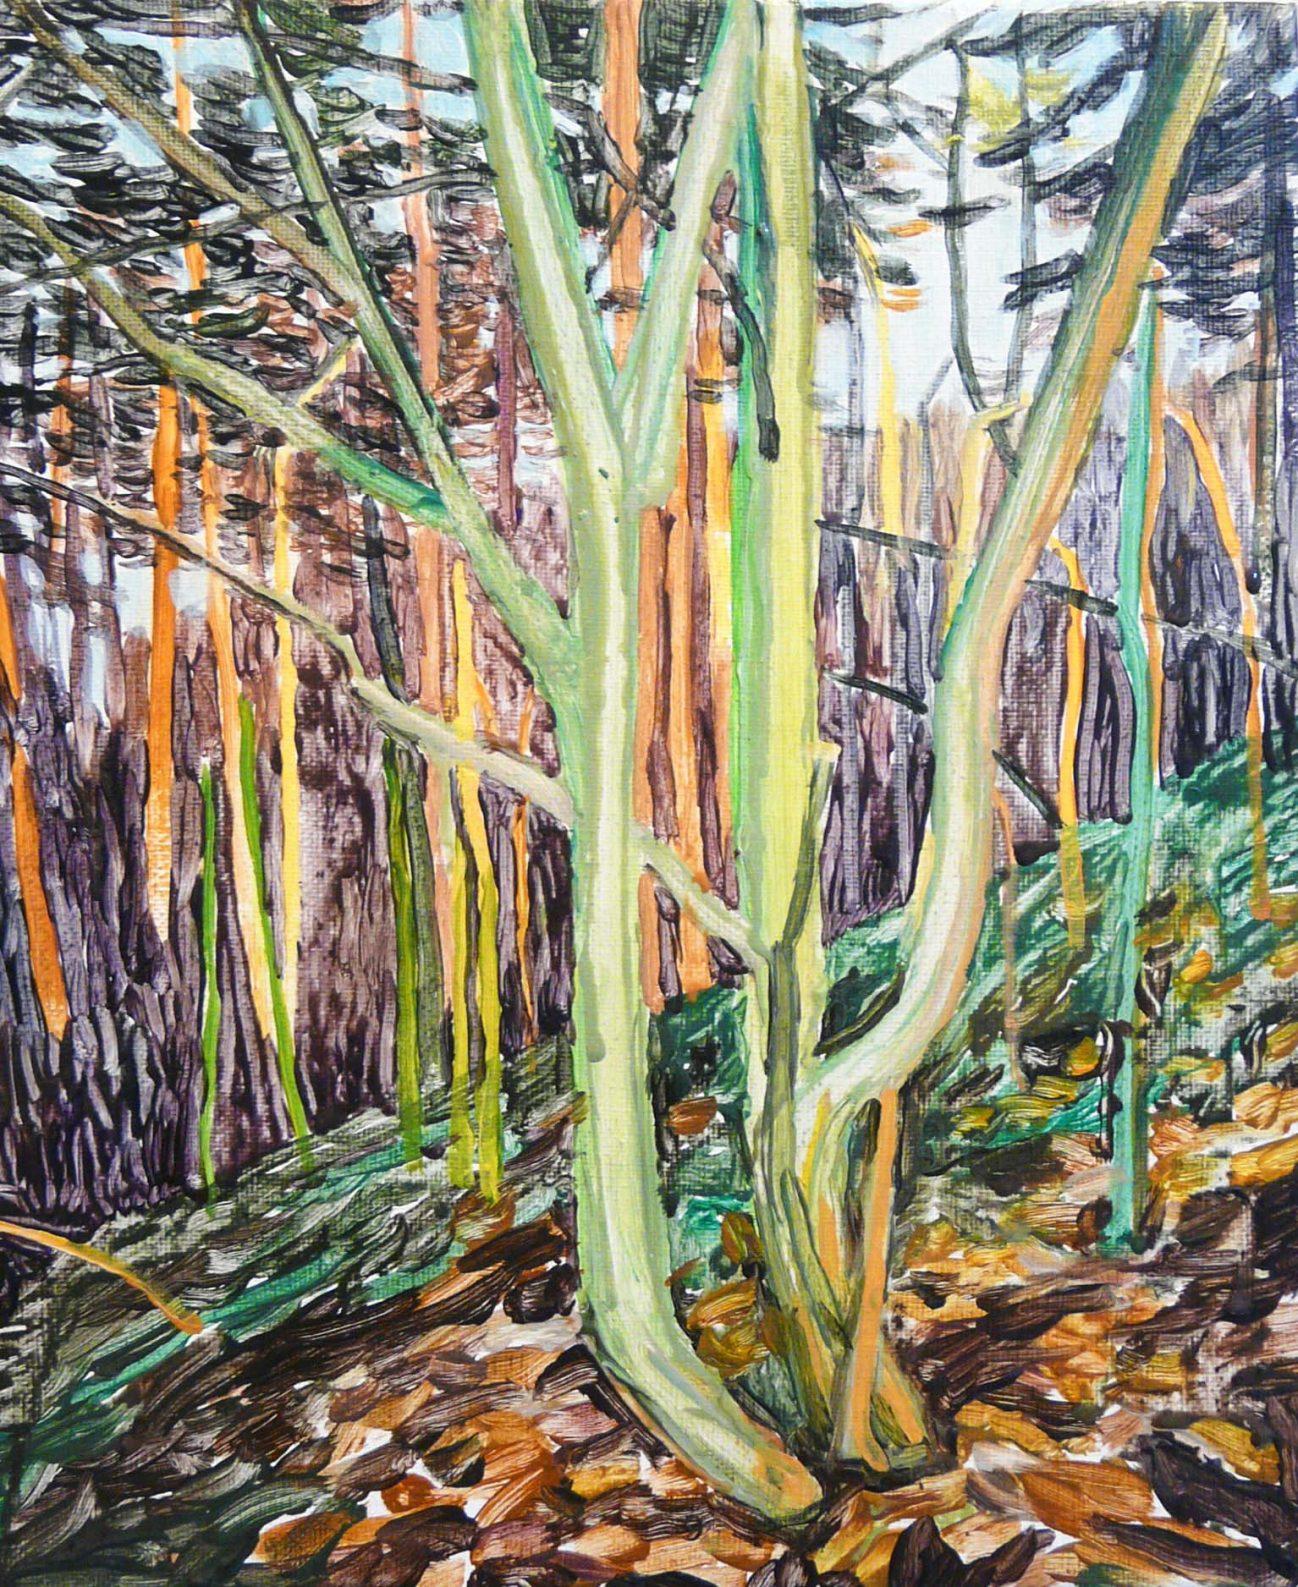 Outskirts autumn 6-6 2015 30×24 Acrylic canvas 2